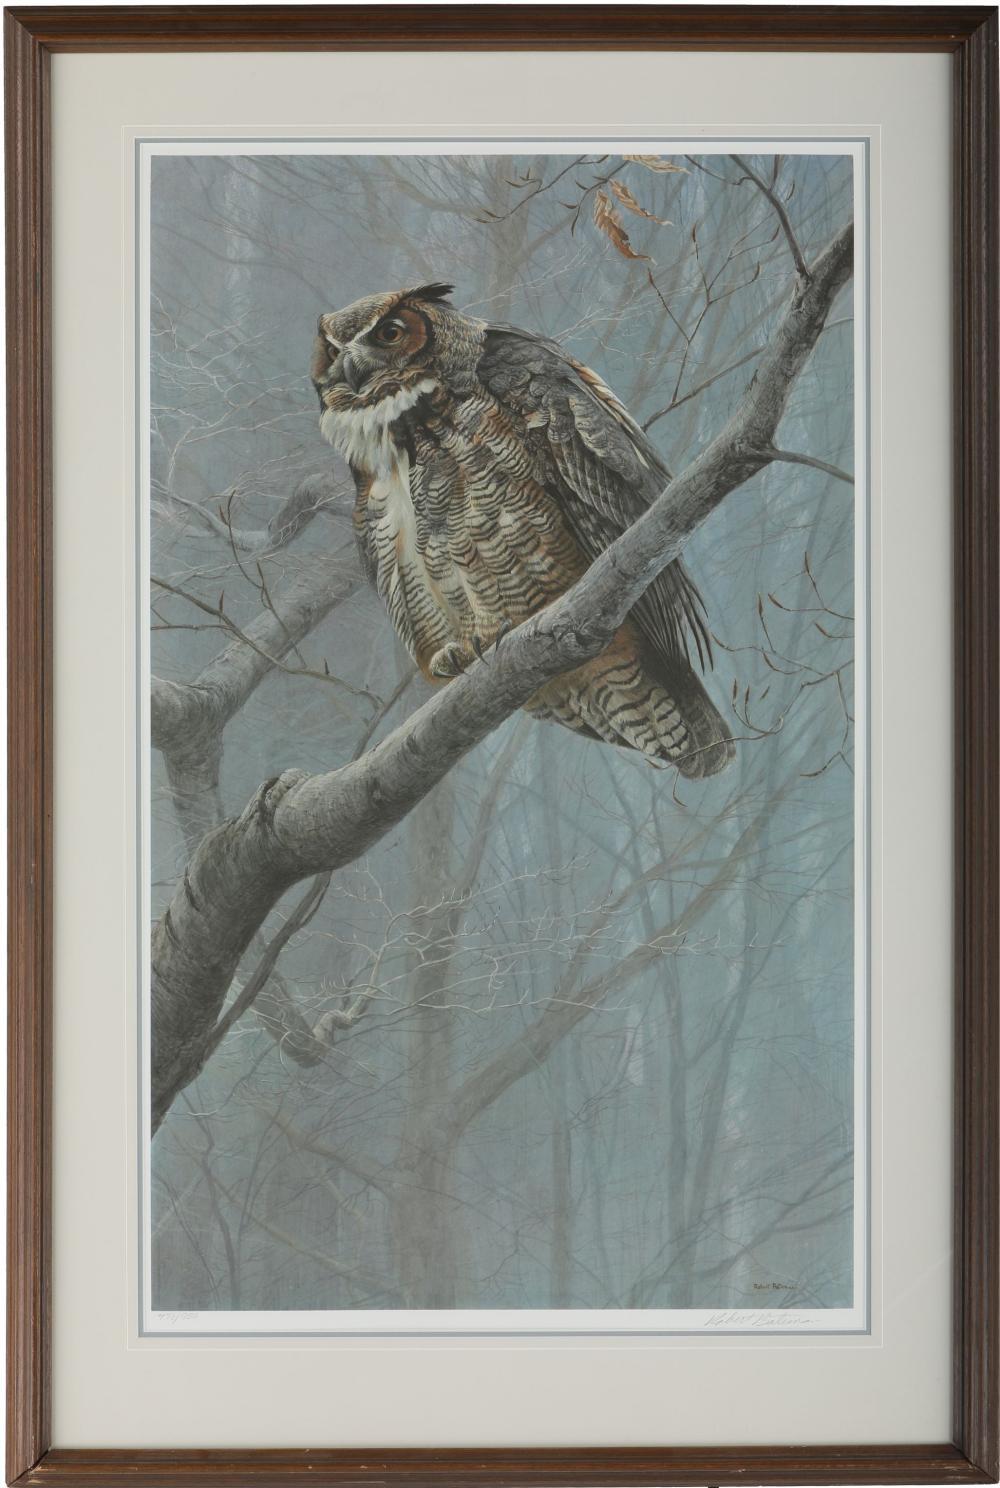 "Robert Bateman's ""Winter Mist - Great Horned Owl"" Limited Edition Print"